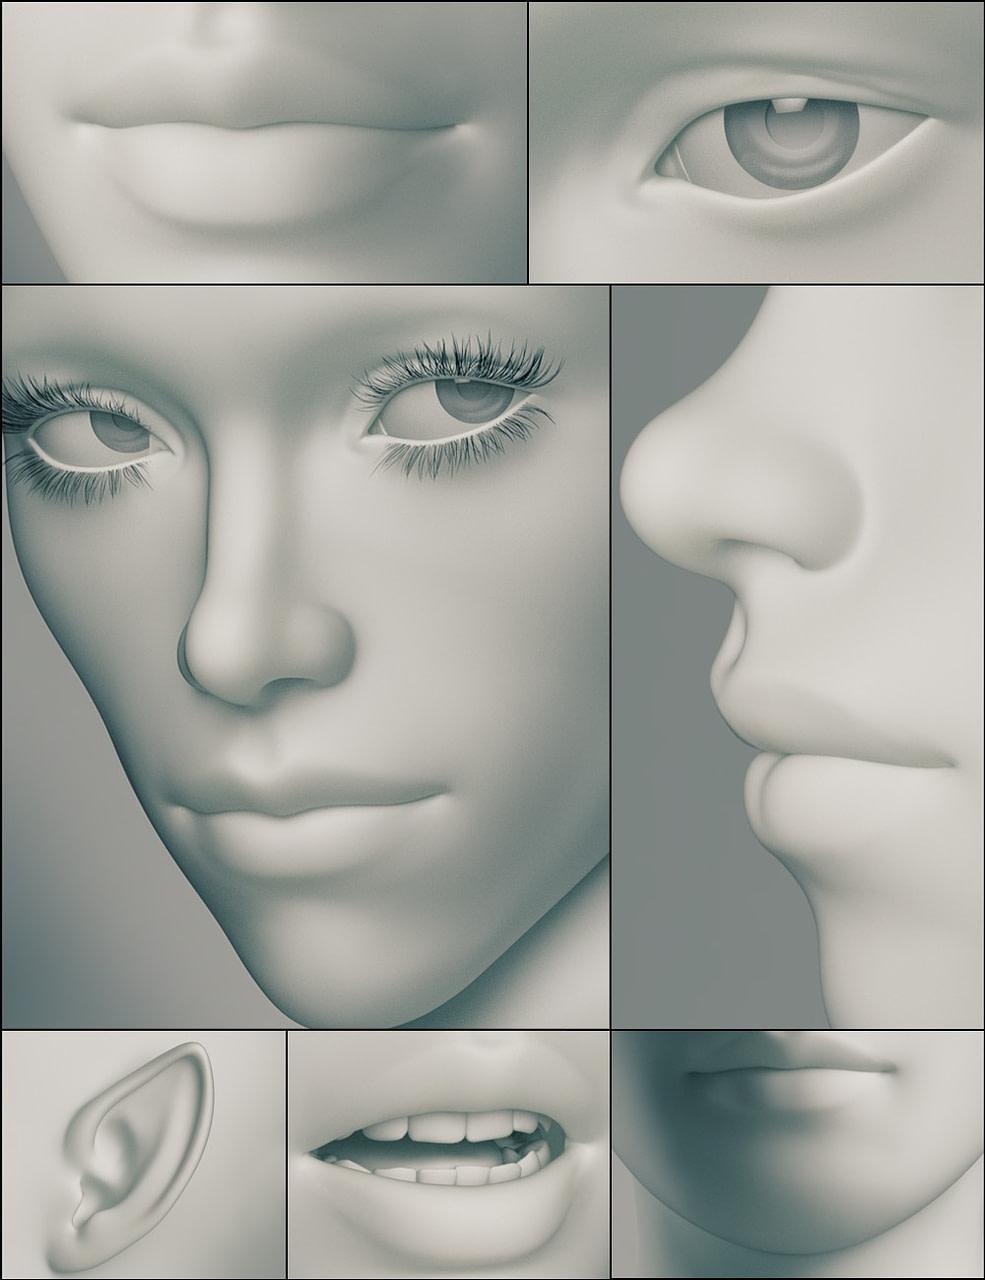 daz3d genesis 3 female head morphs